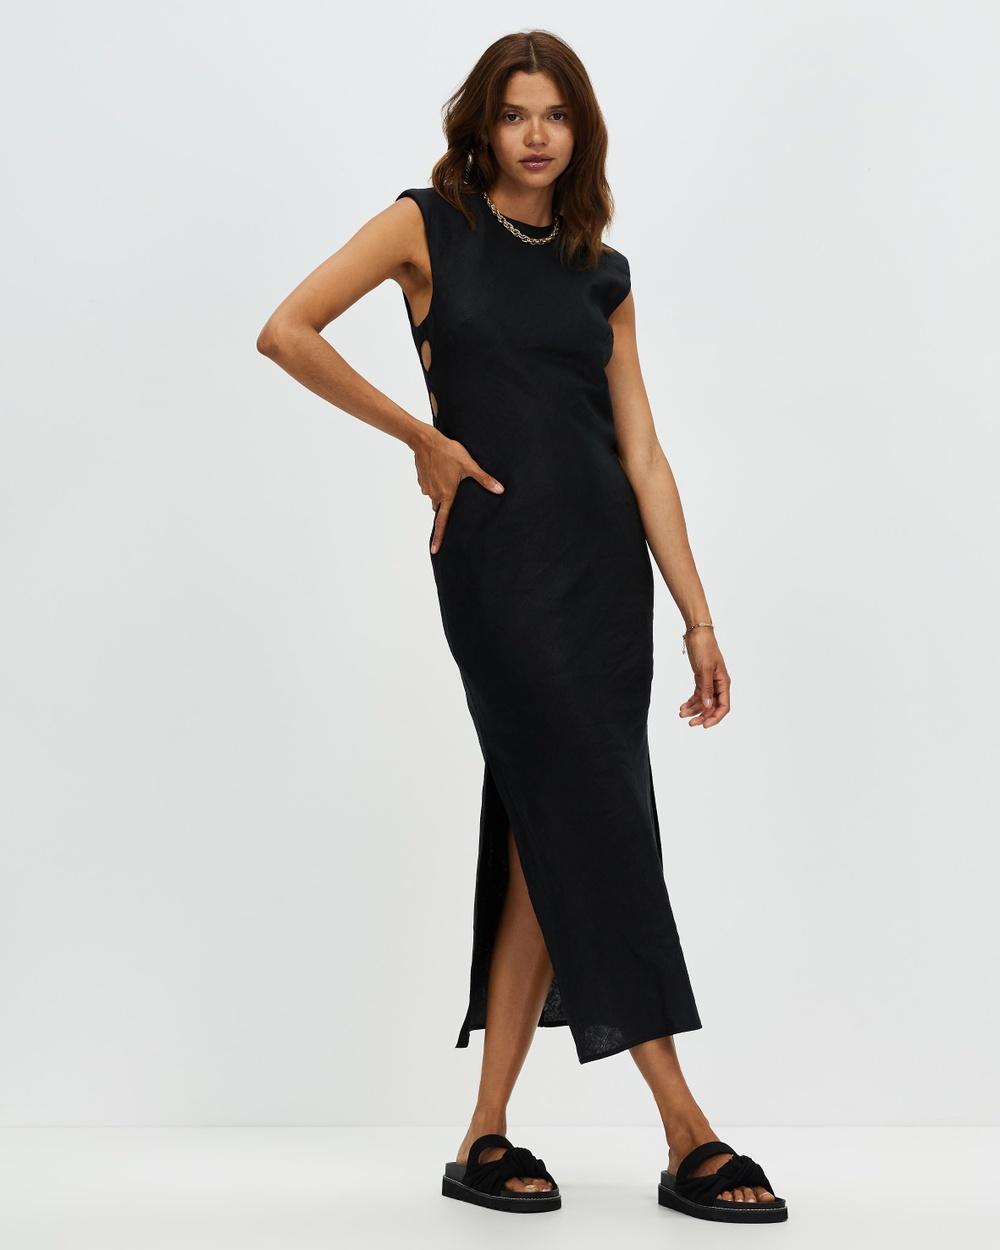 AERE Shoulder Pad Linen Dress Dresses Black